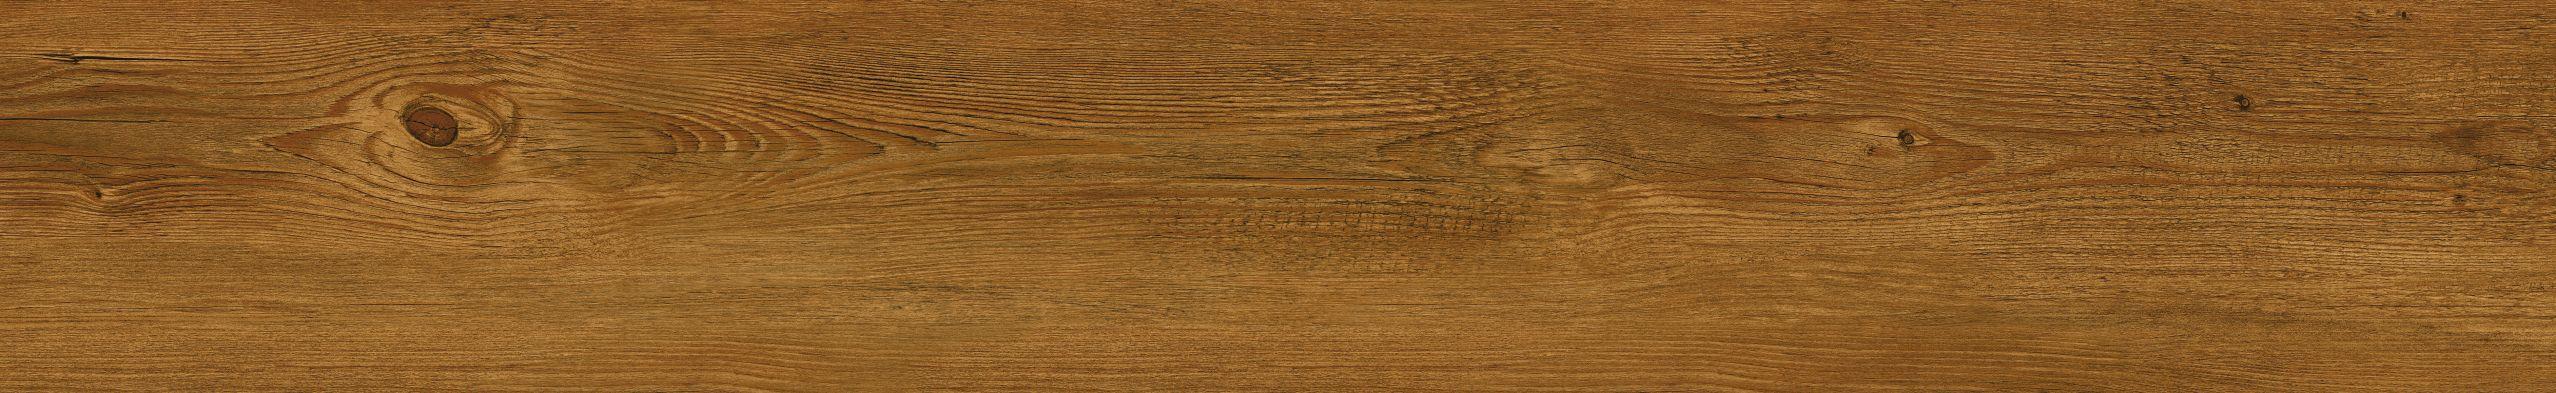 Panele winylowe LVT modulari ® WOOD DRYBACK 19,6 x 132 cm 24450